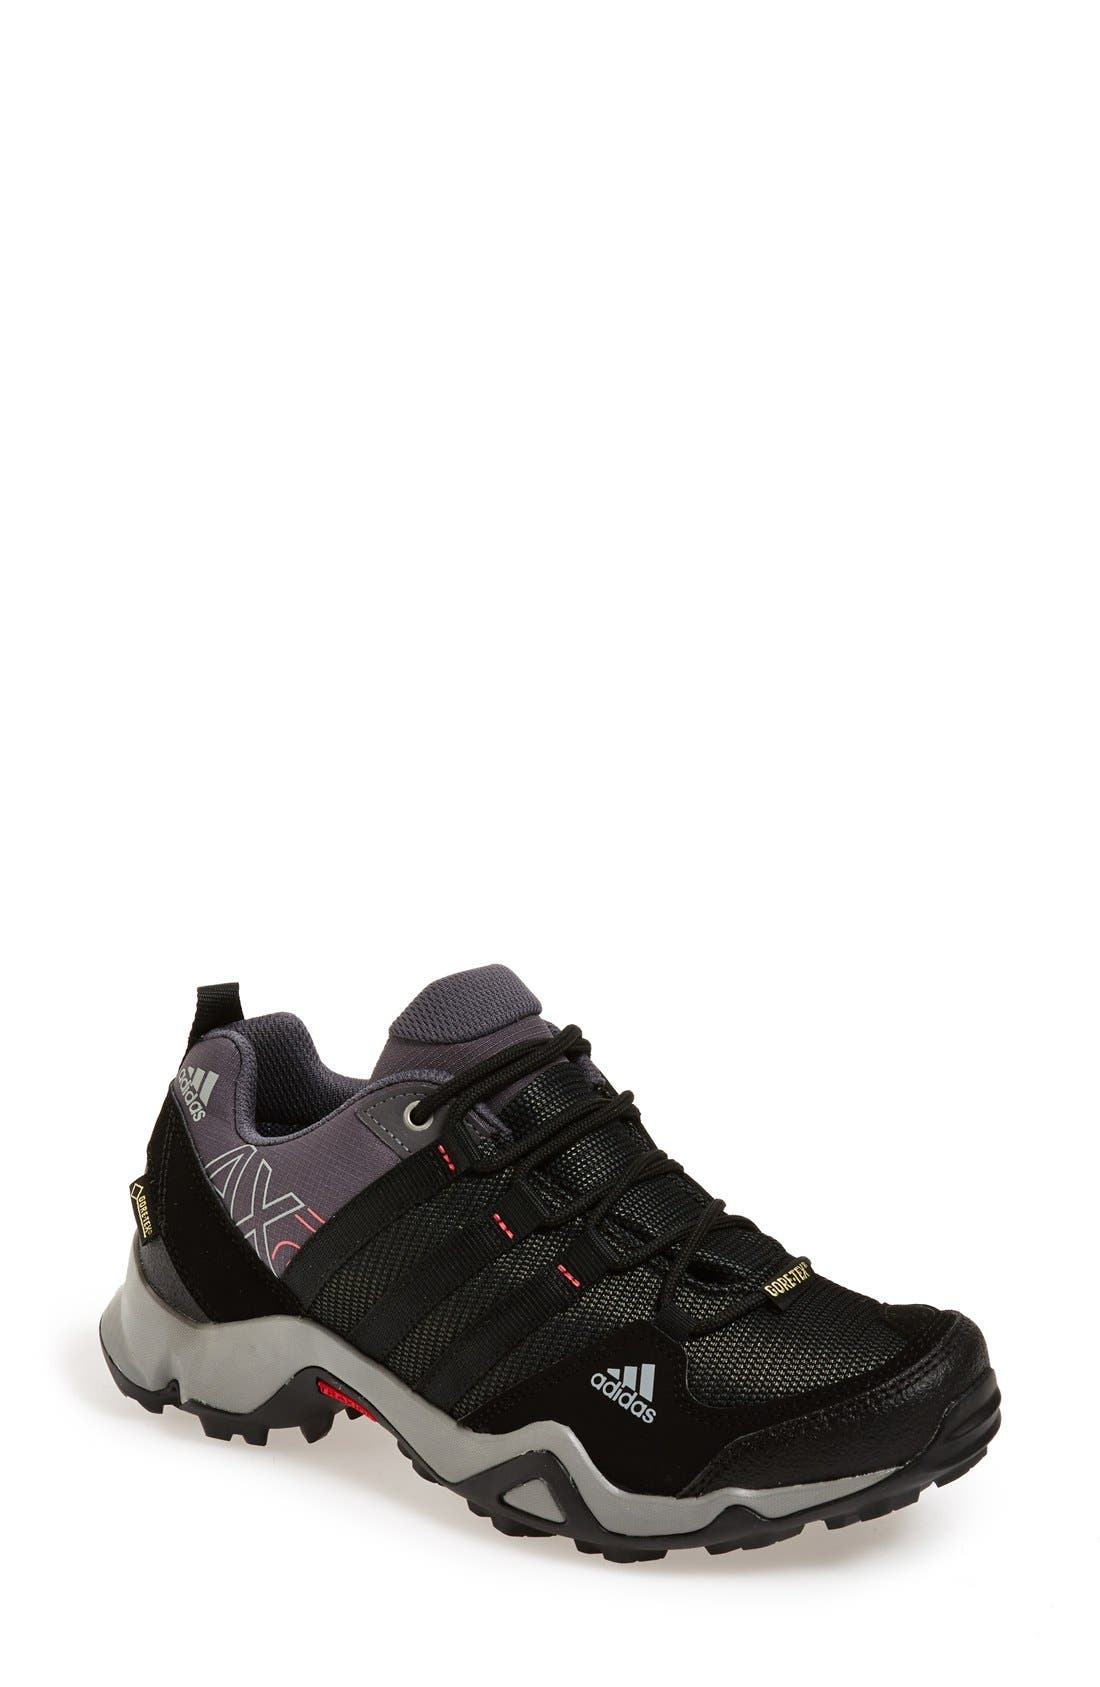 'AX2' Hiking Shoe, Main, color, 010